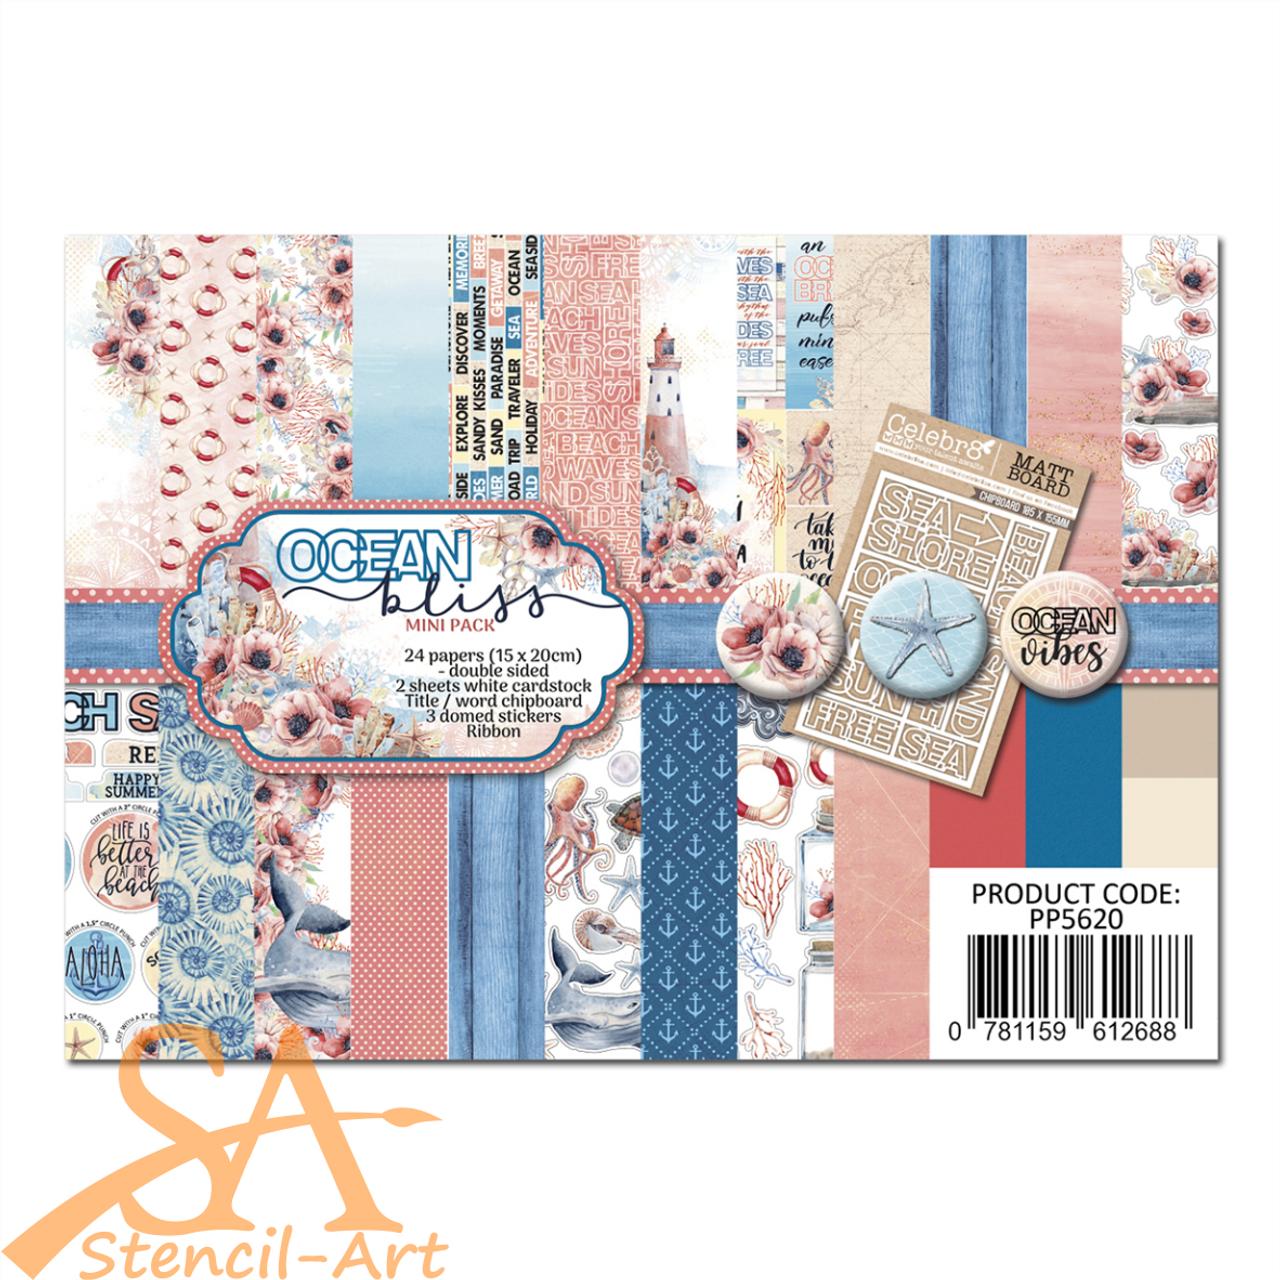 Celebr8 Mini Collection Pack 150 x 200 mm OCEAN BLISS #PP5620